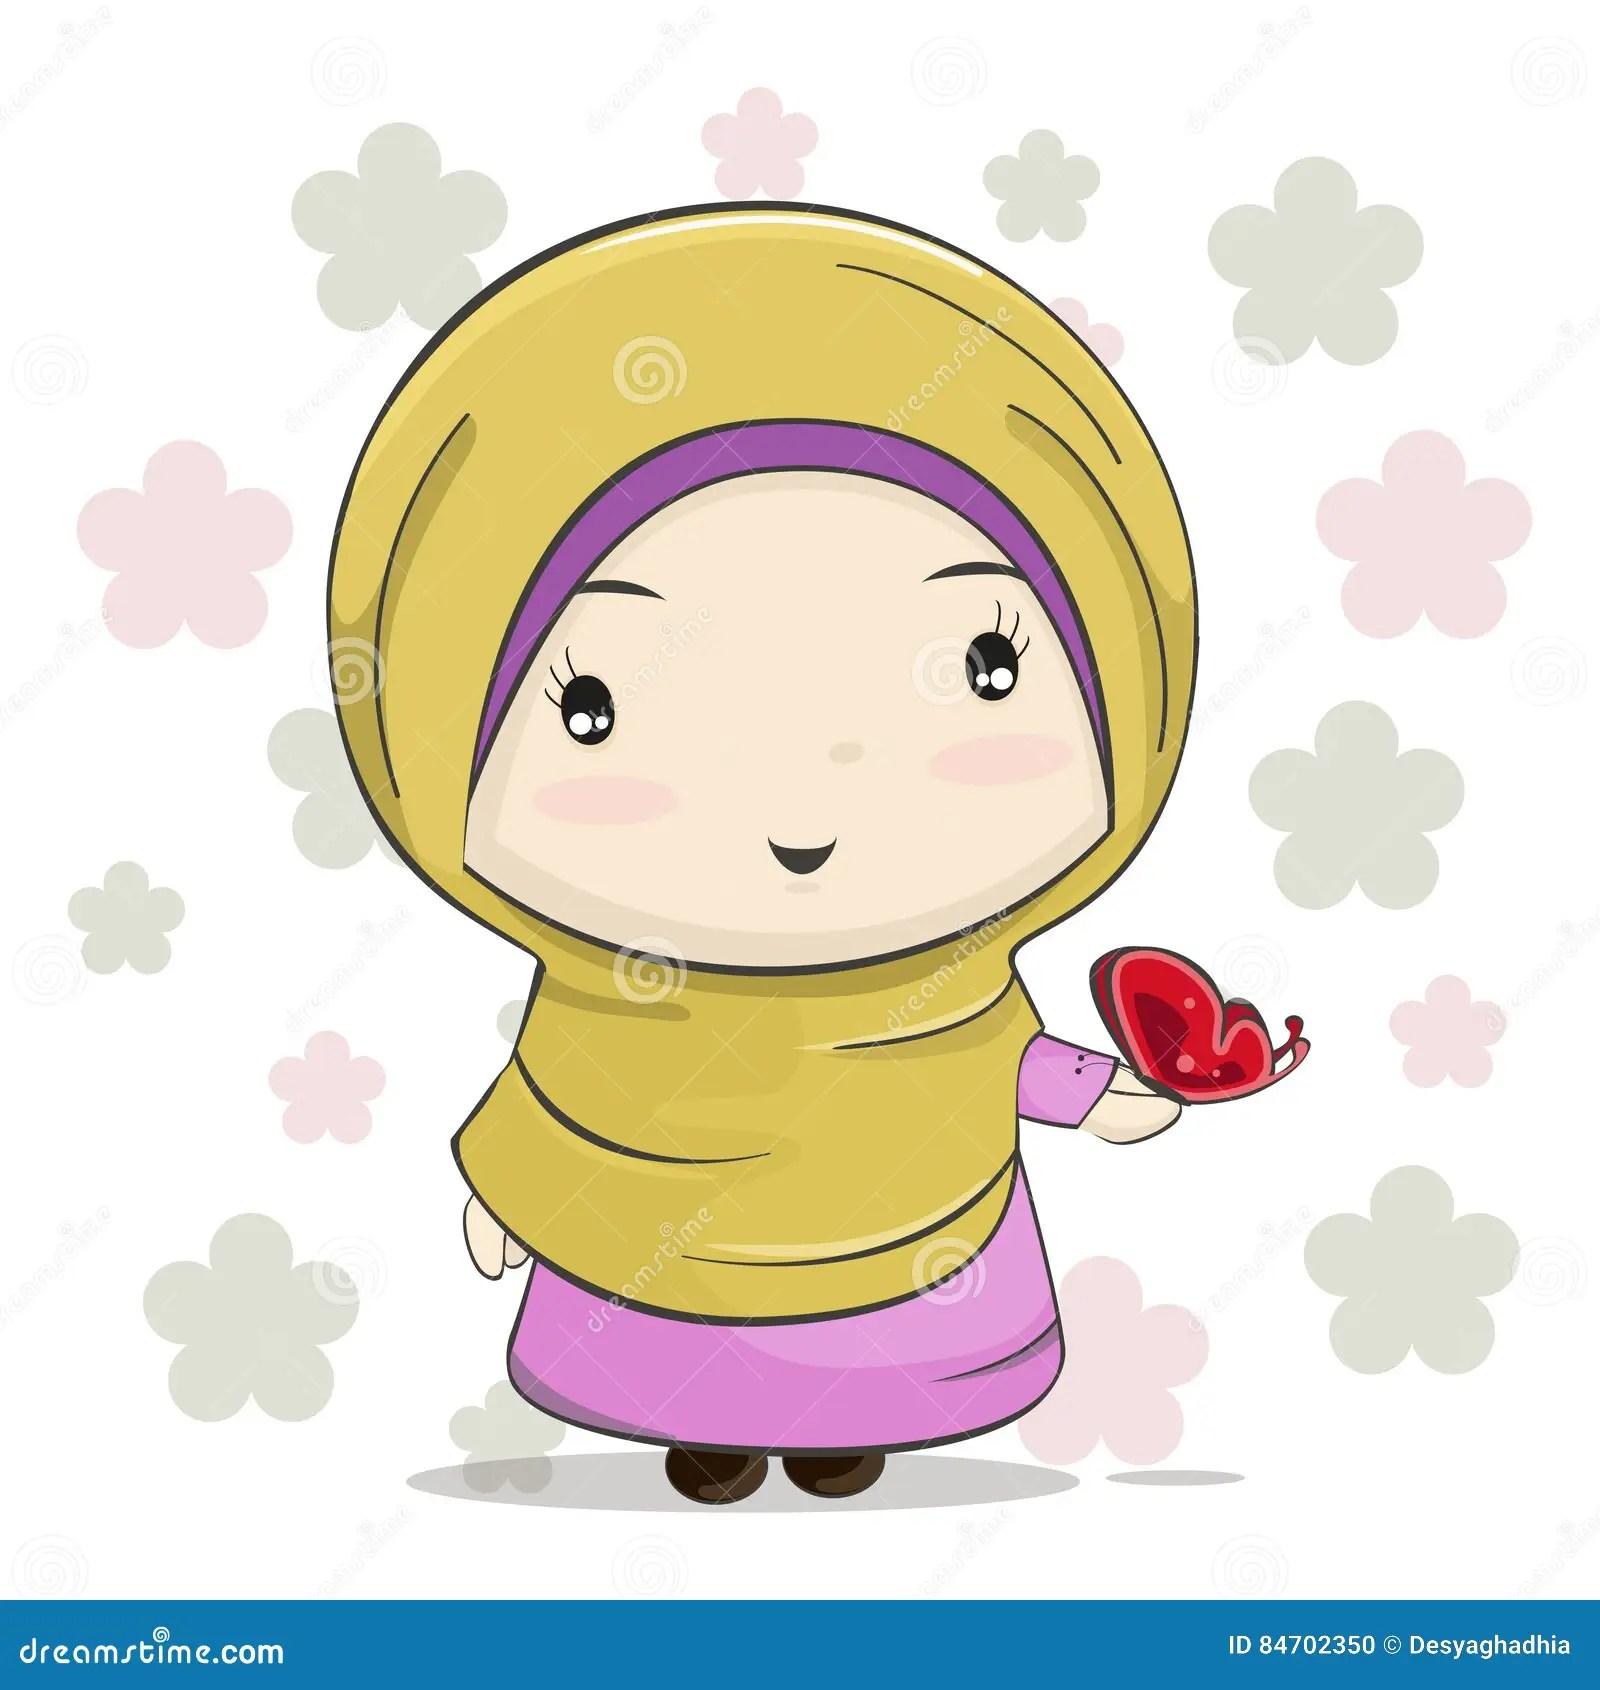 Cute Baby Hijab Wallpaper A Cute Muslim Girl Cartoon Illustration Vector